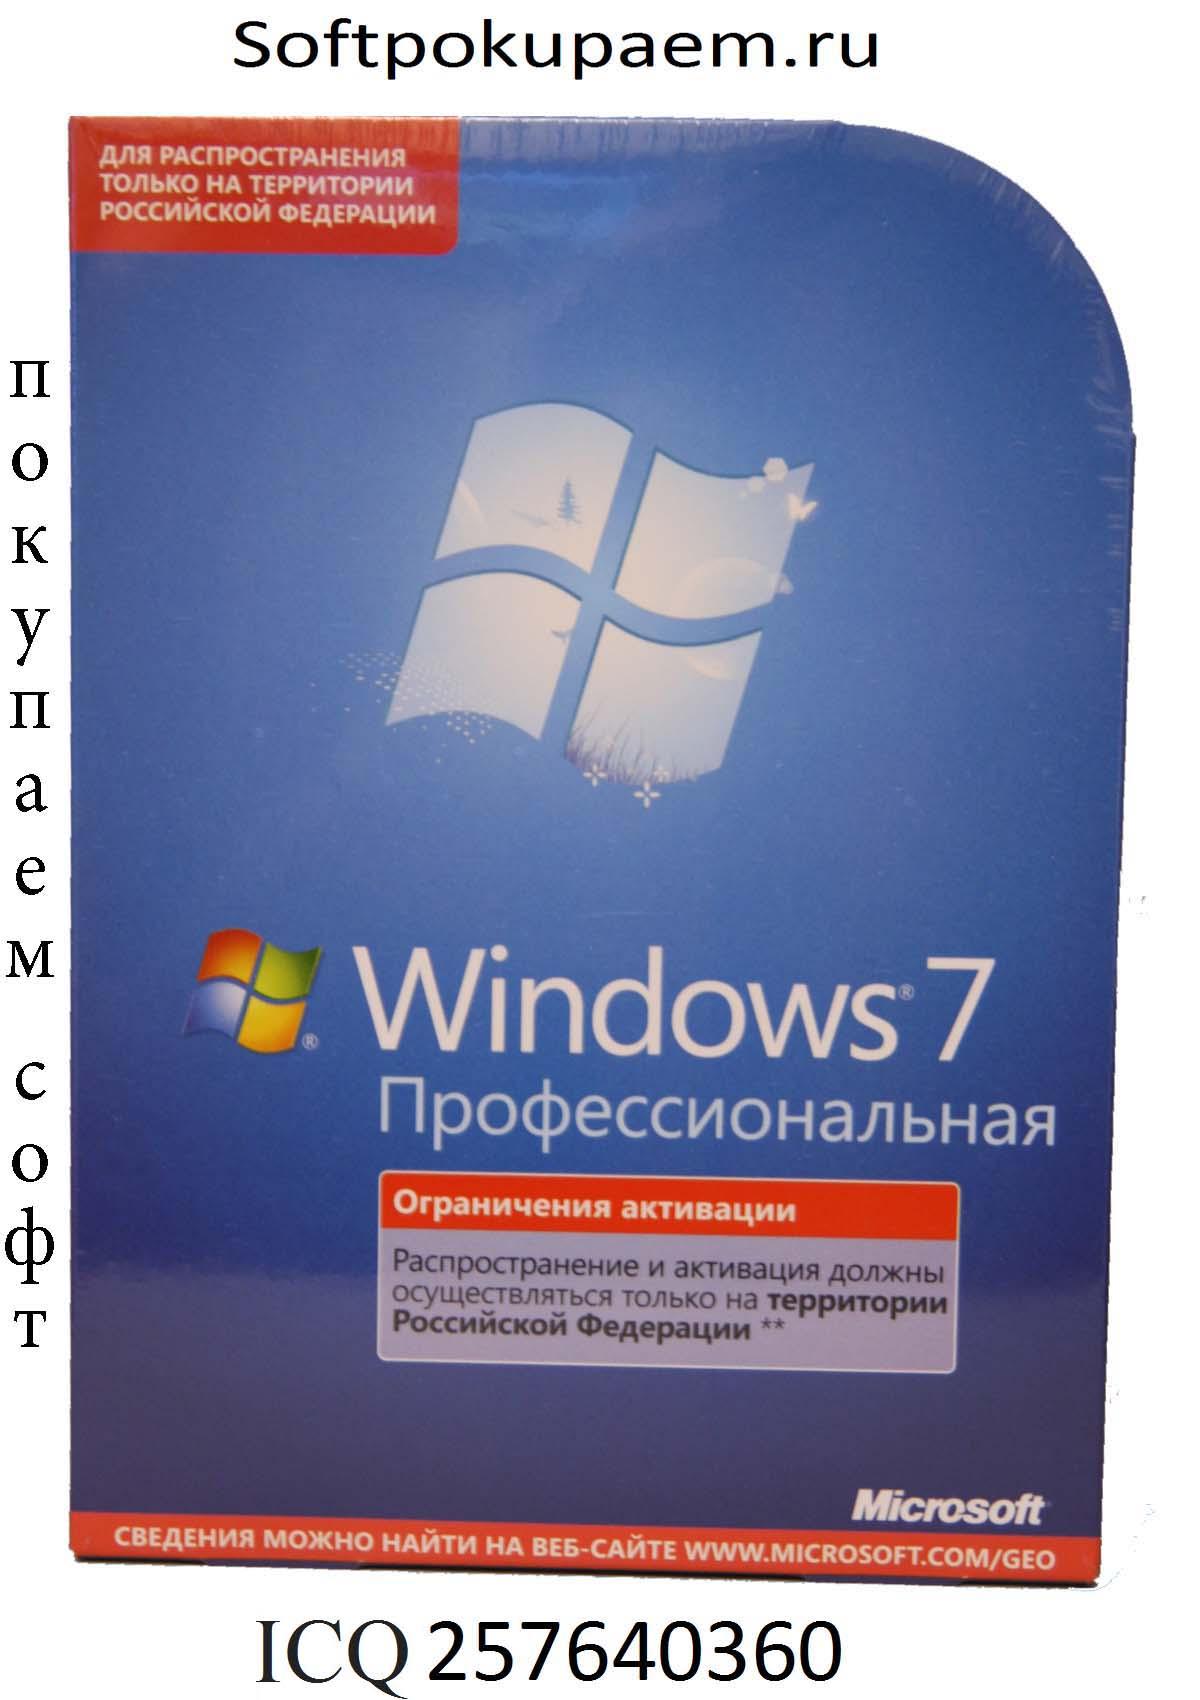 Microsoft (Майкрософт) купим дорого лицензионное п.о.